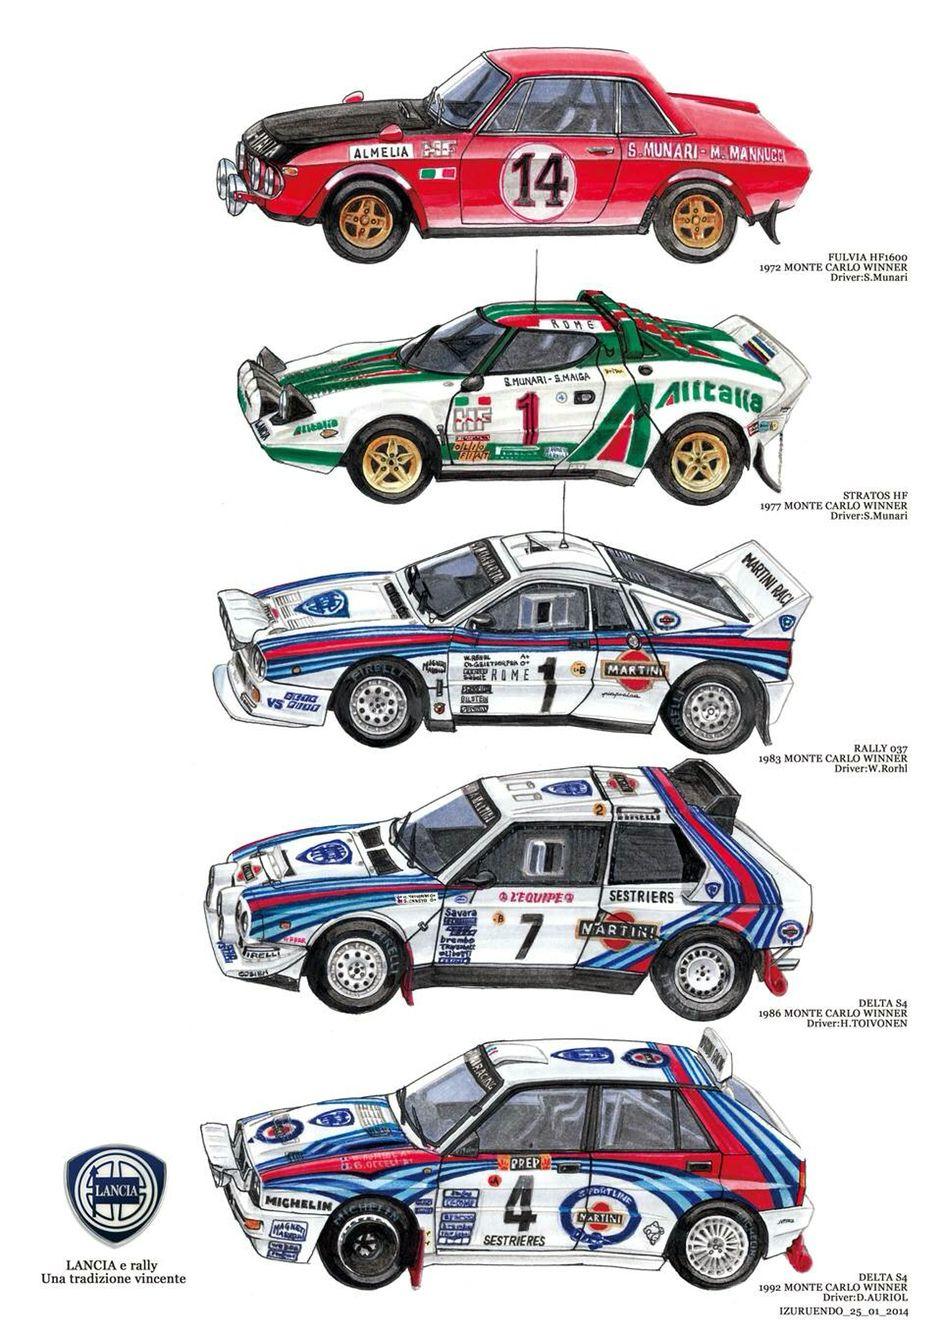 Lacia rally history | Car | Pinterest | Rally, History and Cars